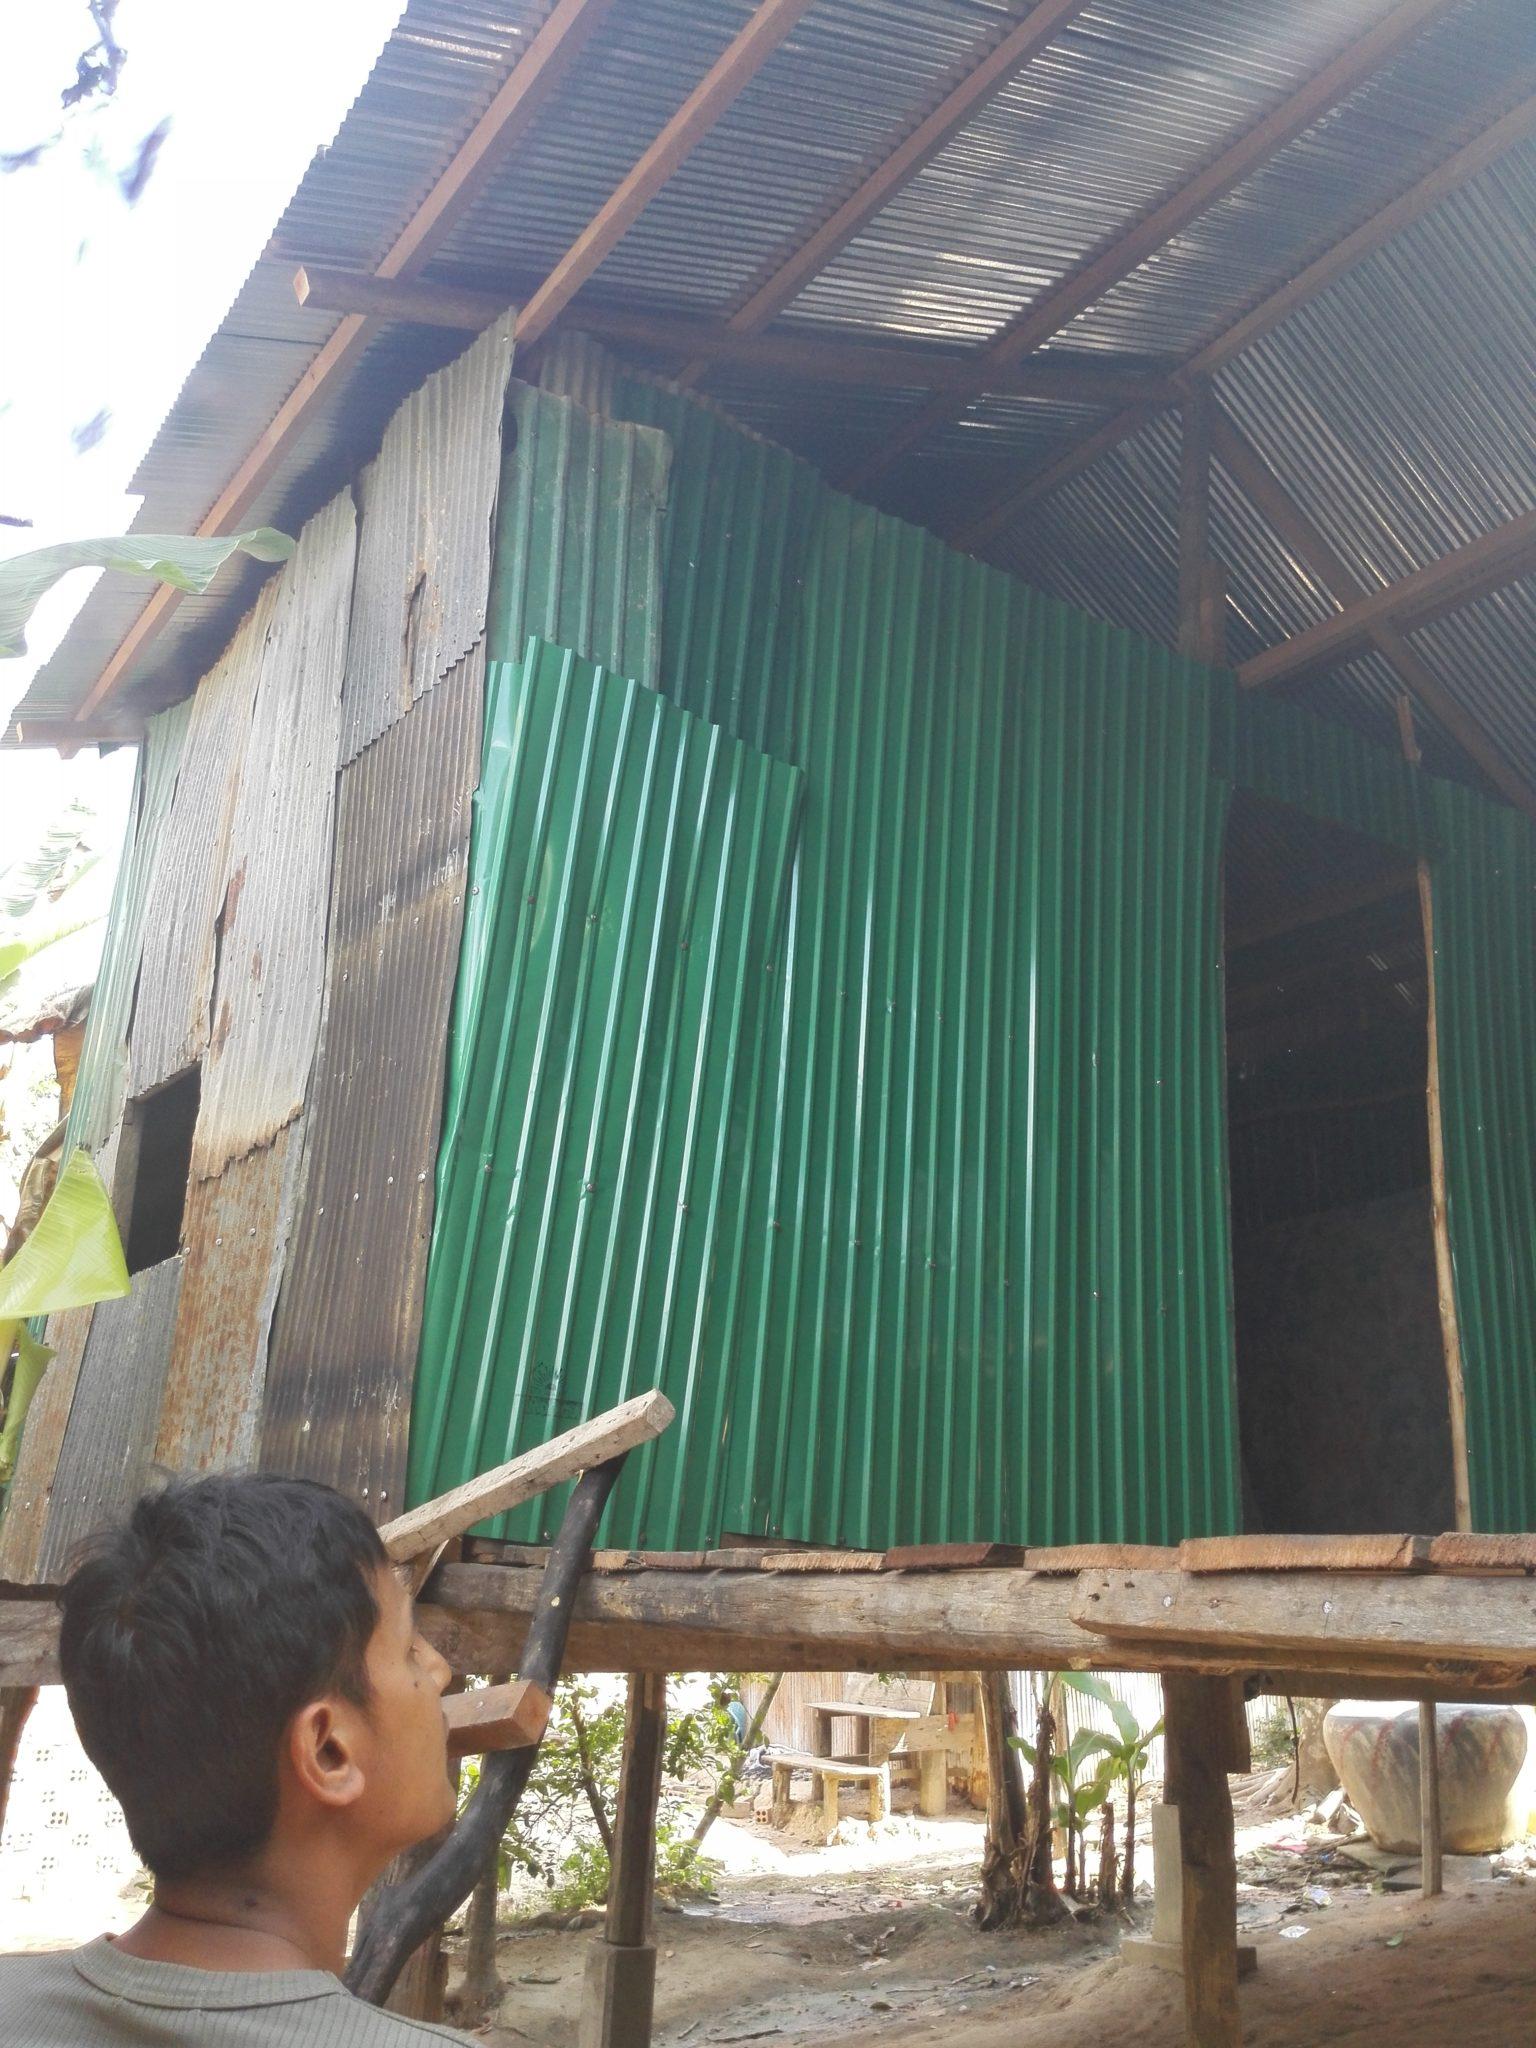 neues dach und fassade nach brand kamboo project. Black Bedroom Furniture Sets. Home Design Ideas